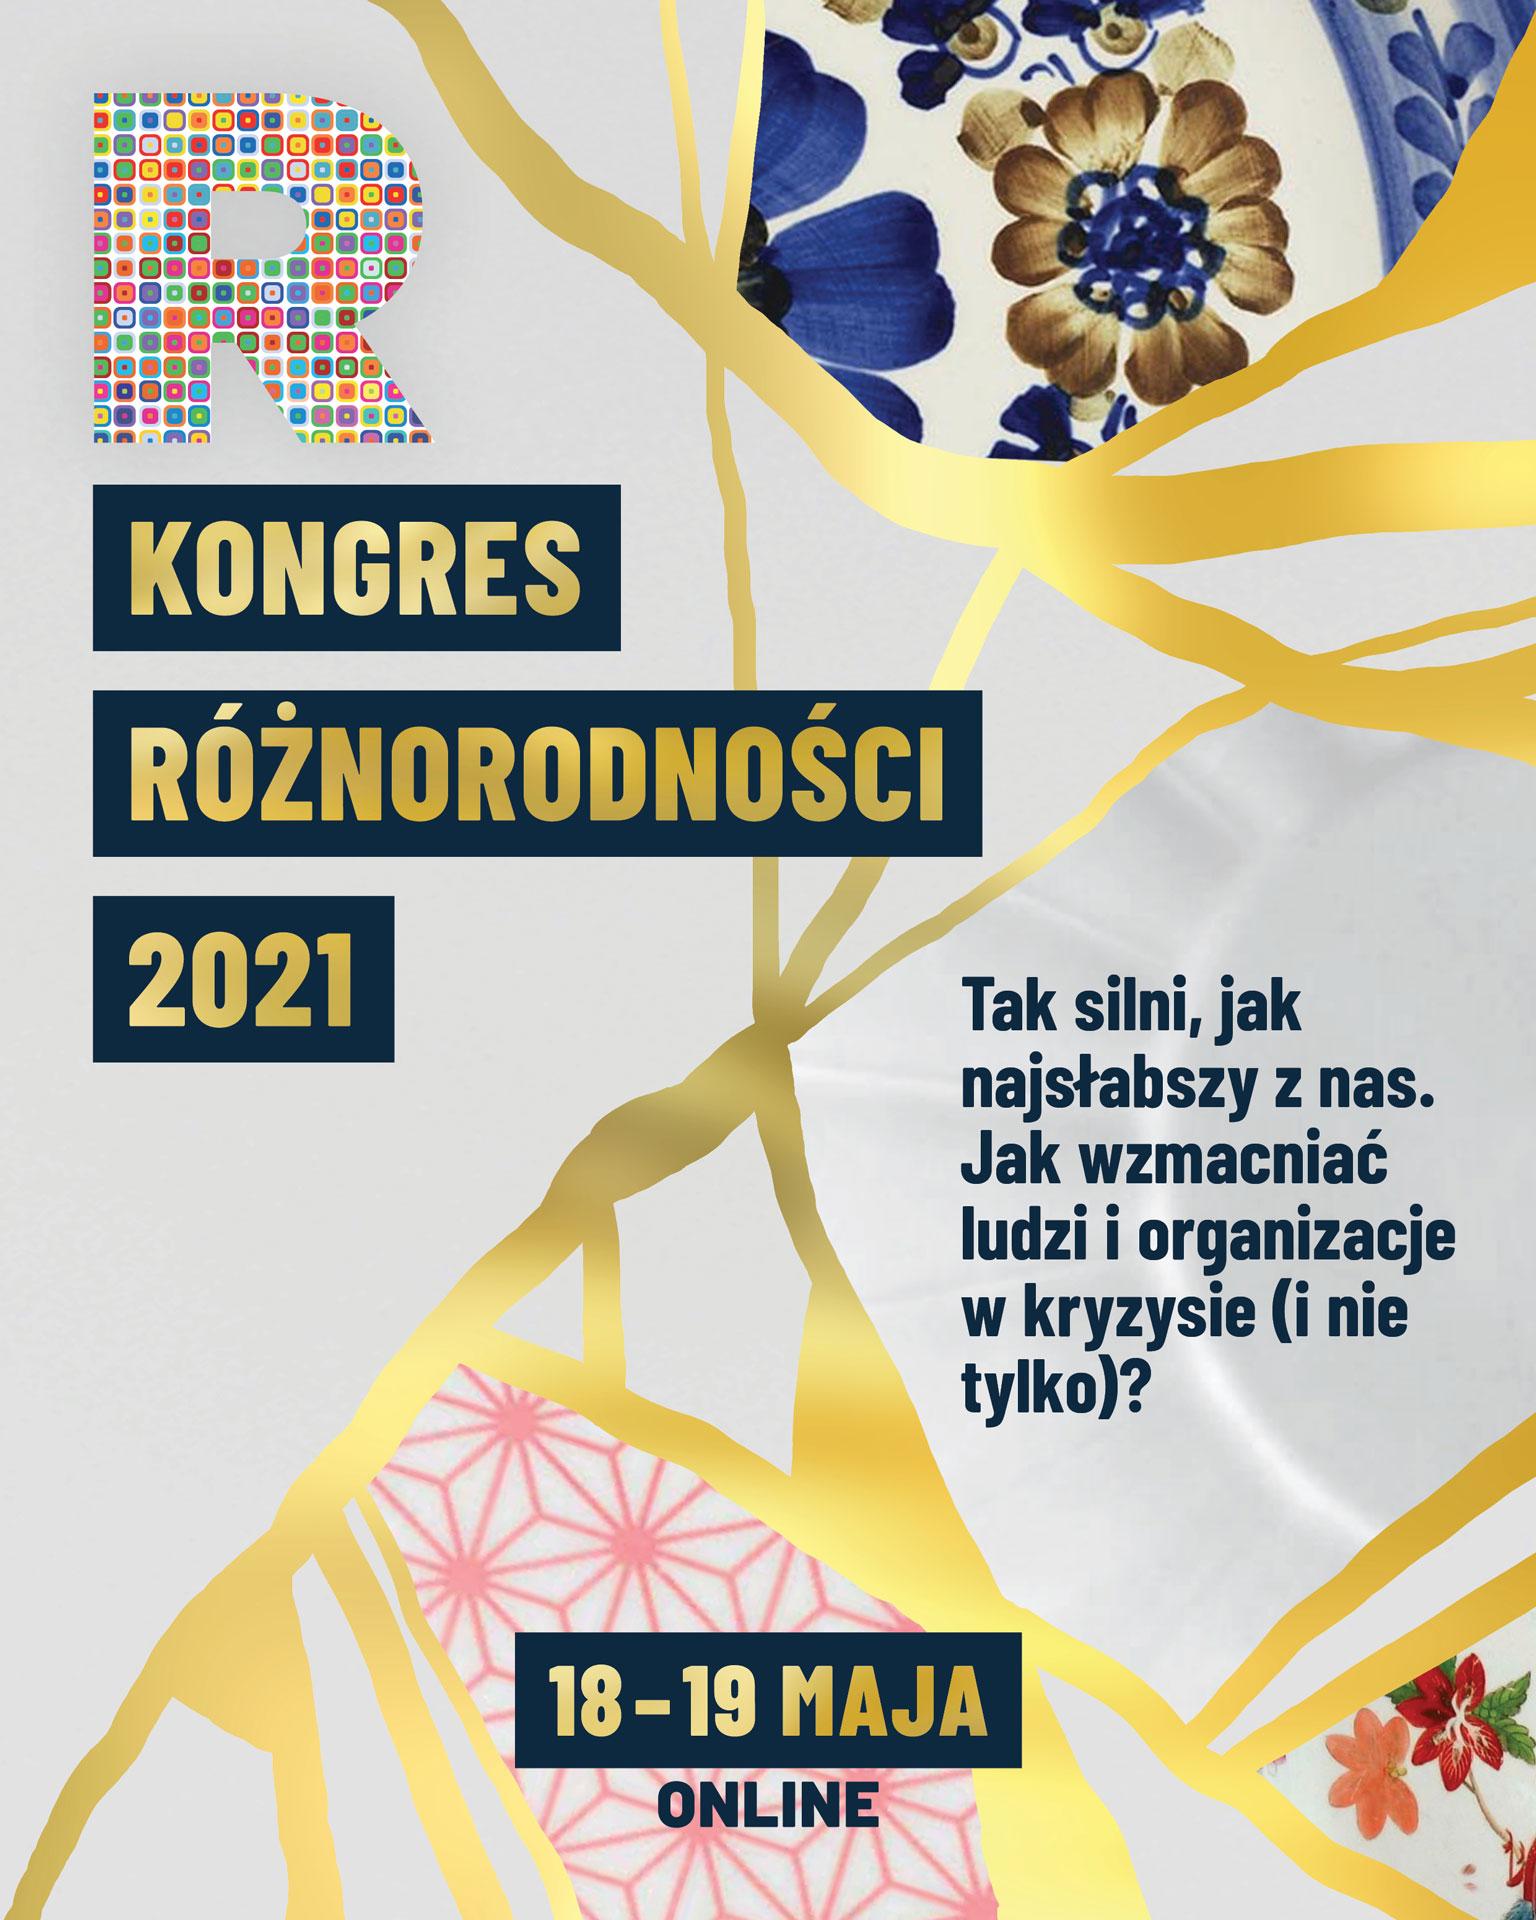 Kongres Różnorodności 2021